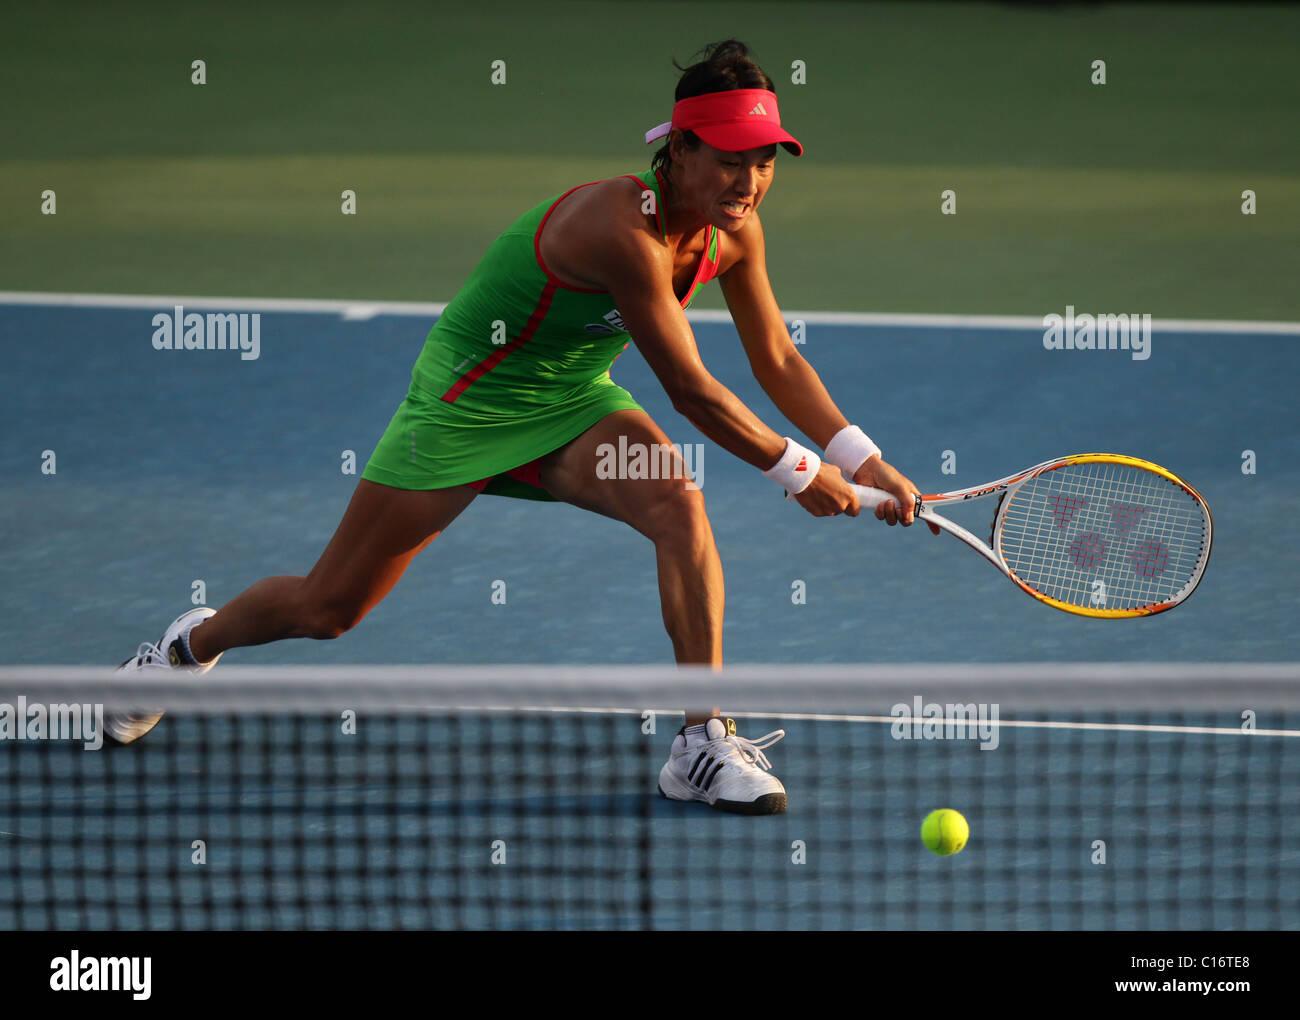 Tennis player Kimiko Date-Krumm of Japan - Stock Image